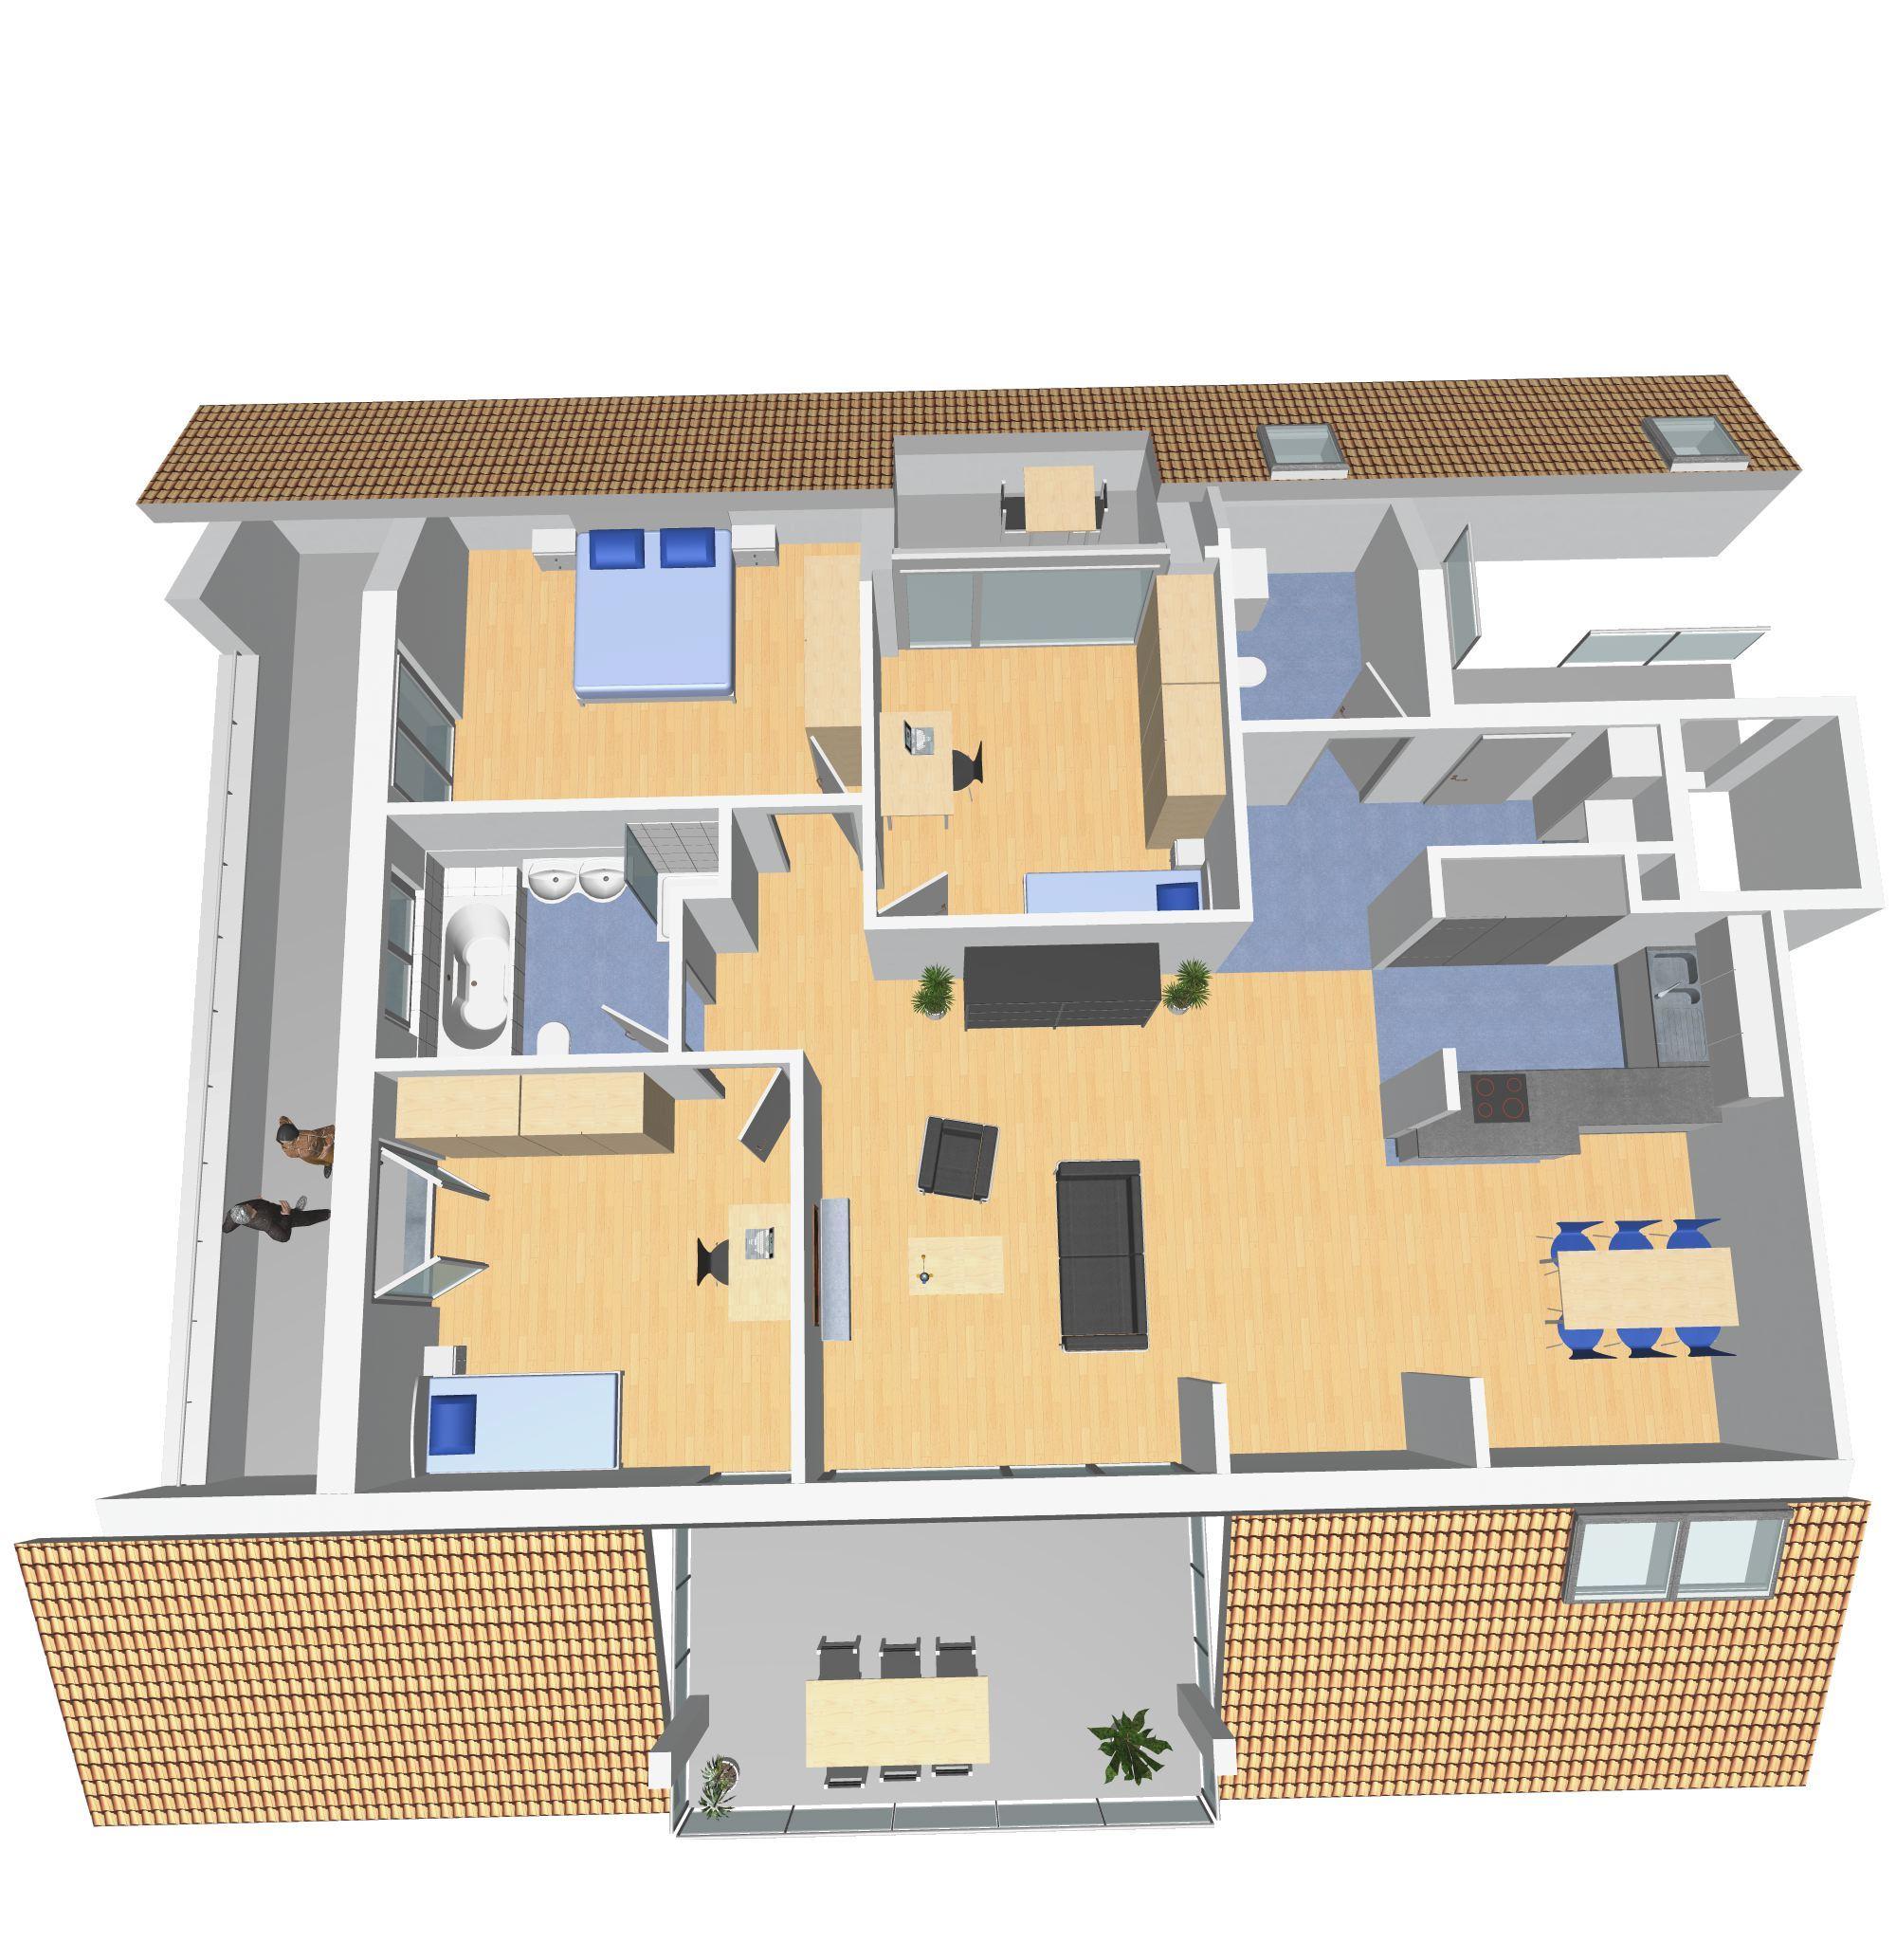 4 5 zimmer attika whg west leimbach landi. Black Bedroom Furniture Sets. Home Design Ideas